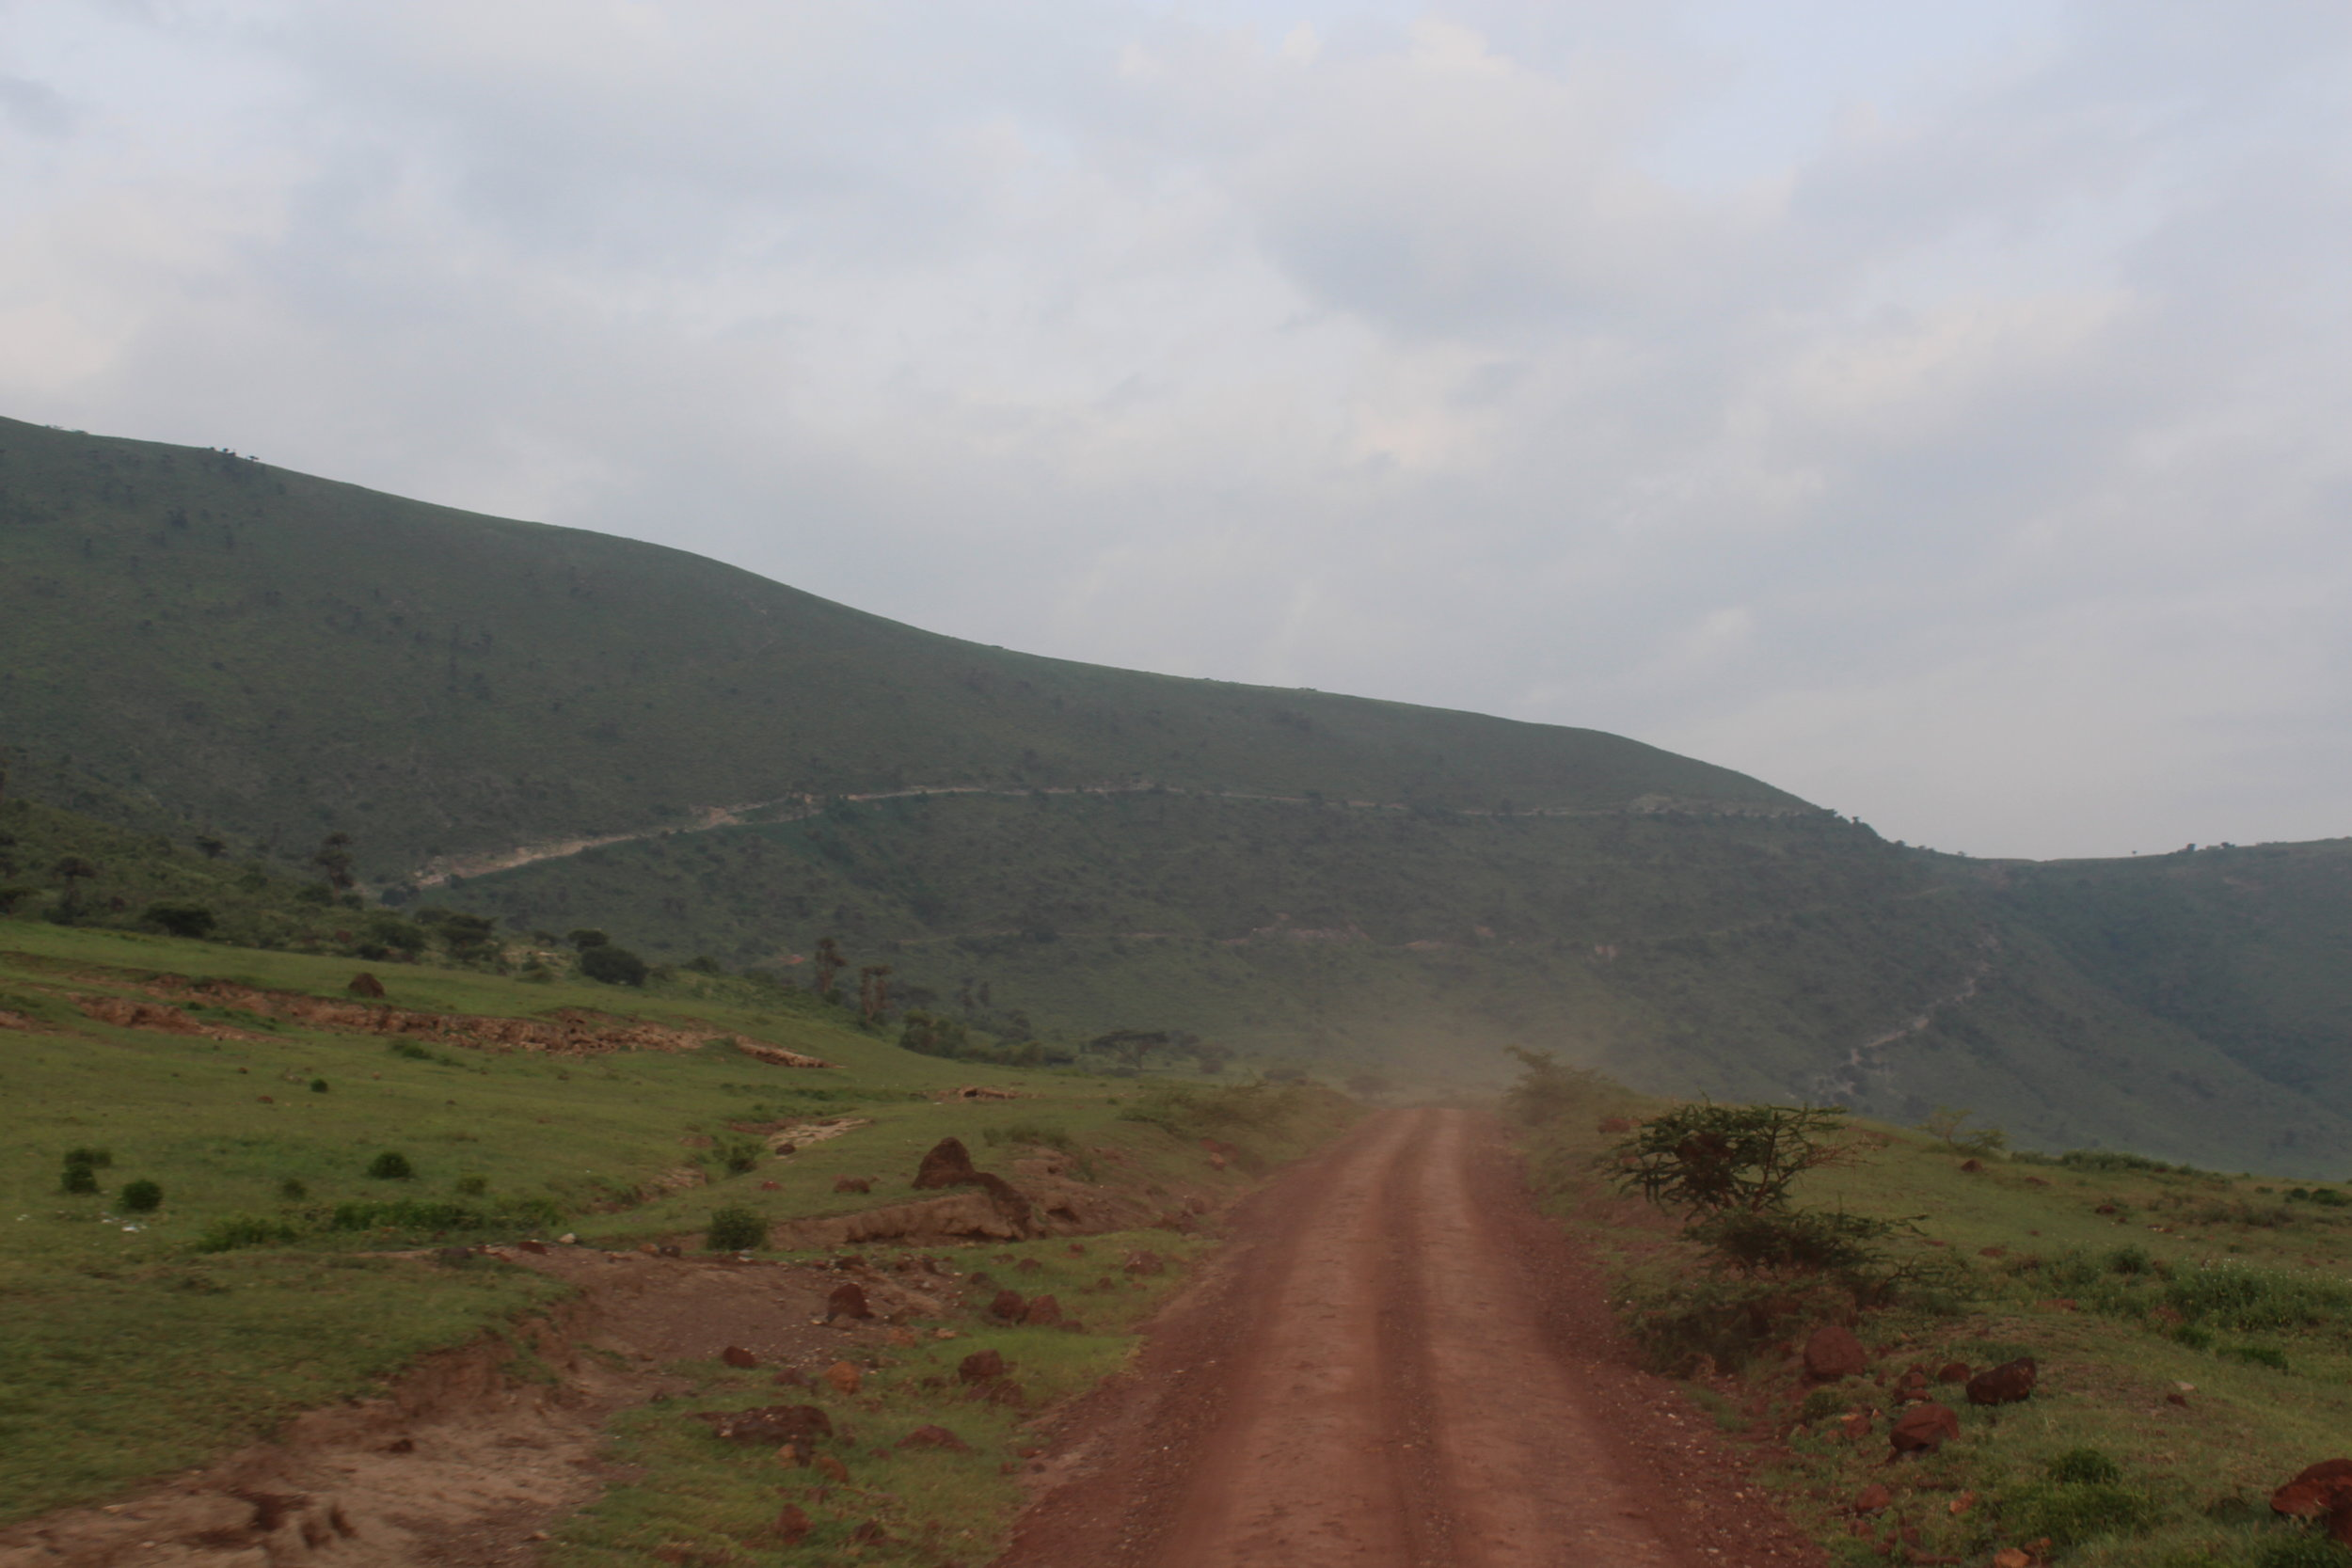 Road down to Ngorongoro Crater